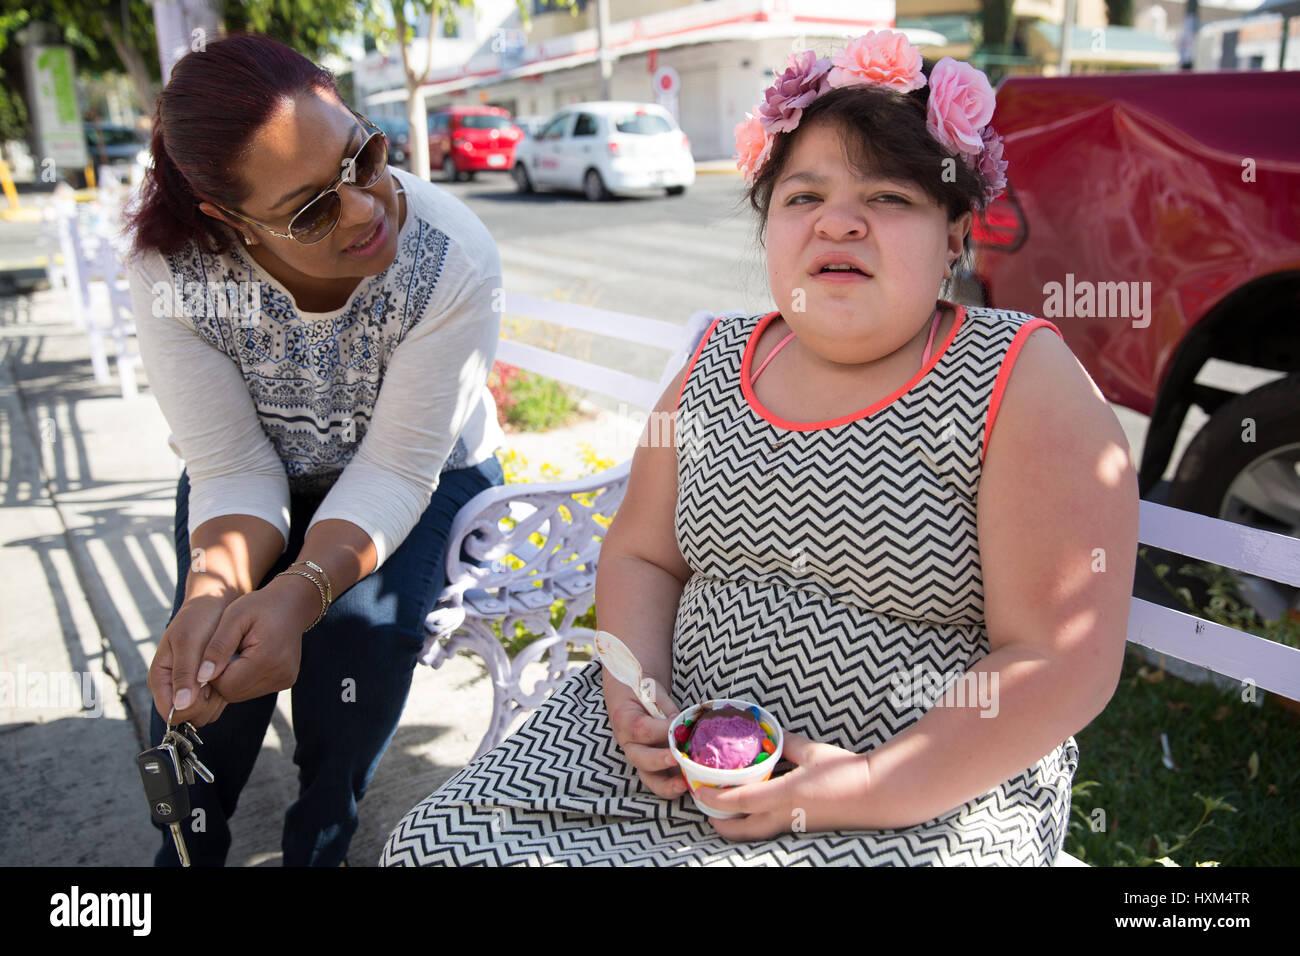 Ana Ximena Navarro (R) and her aunt Gabriela Rios Ballesteros (L), eat an ice cream in Guadalajara, Mexico on February - Stock Image